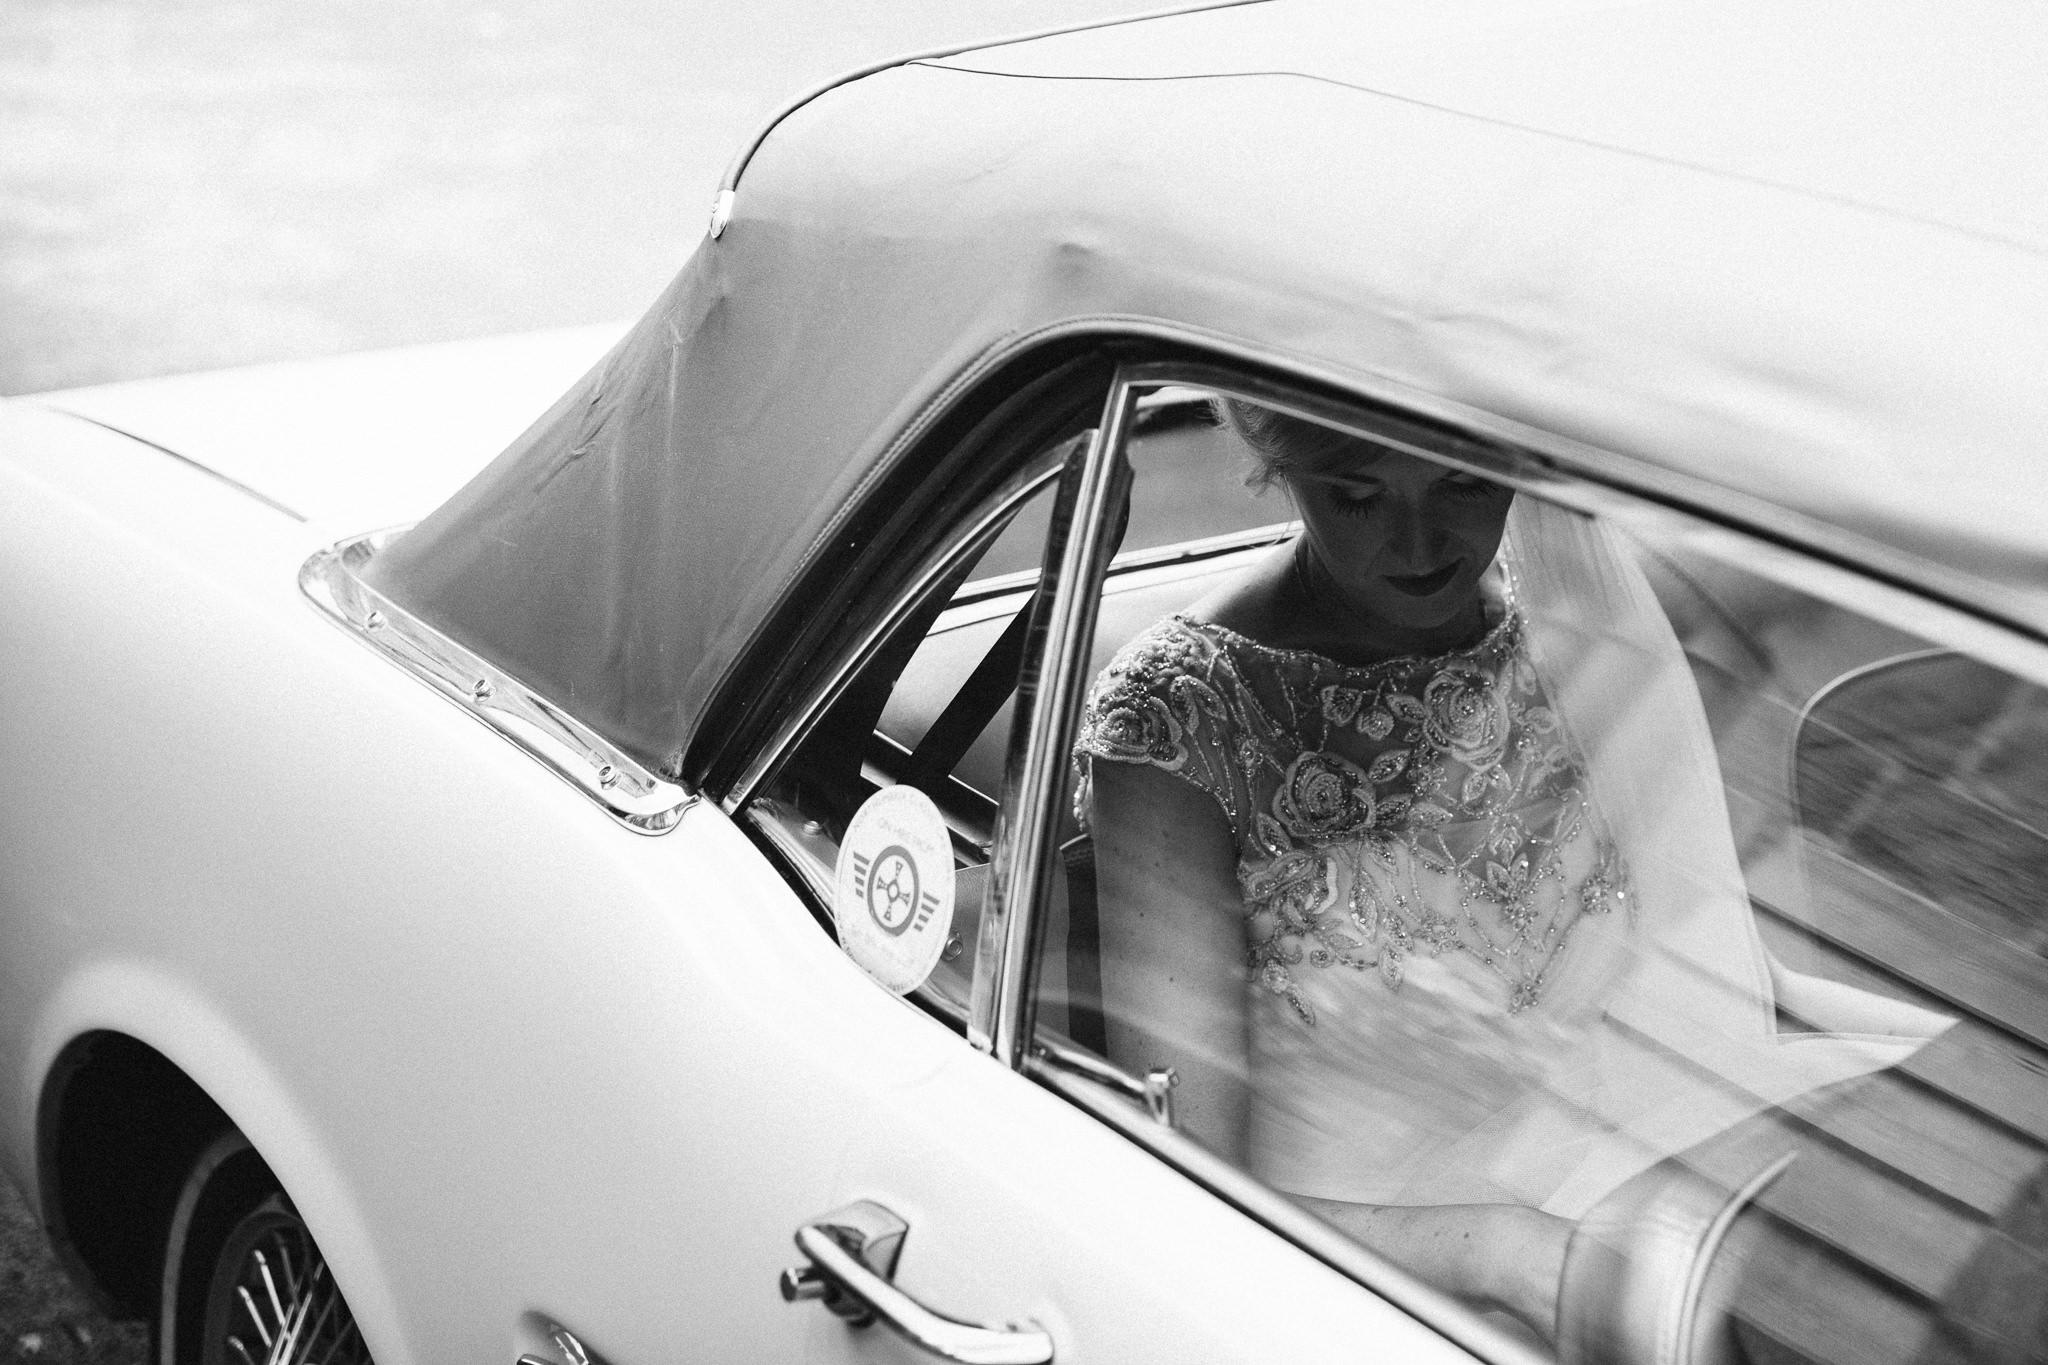 northside-farm-wedding-northumberland-margarita-hope (24).jpg